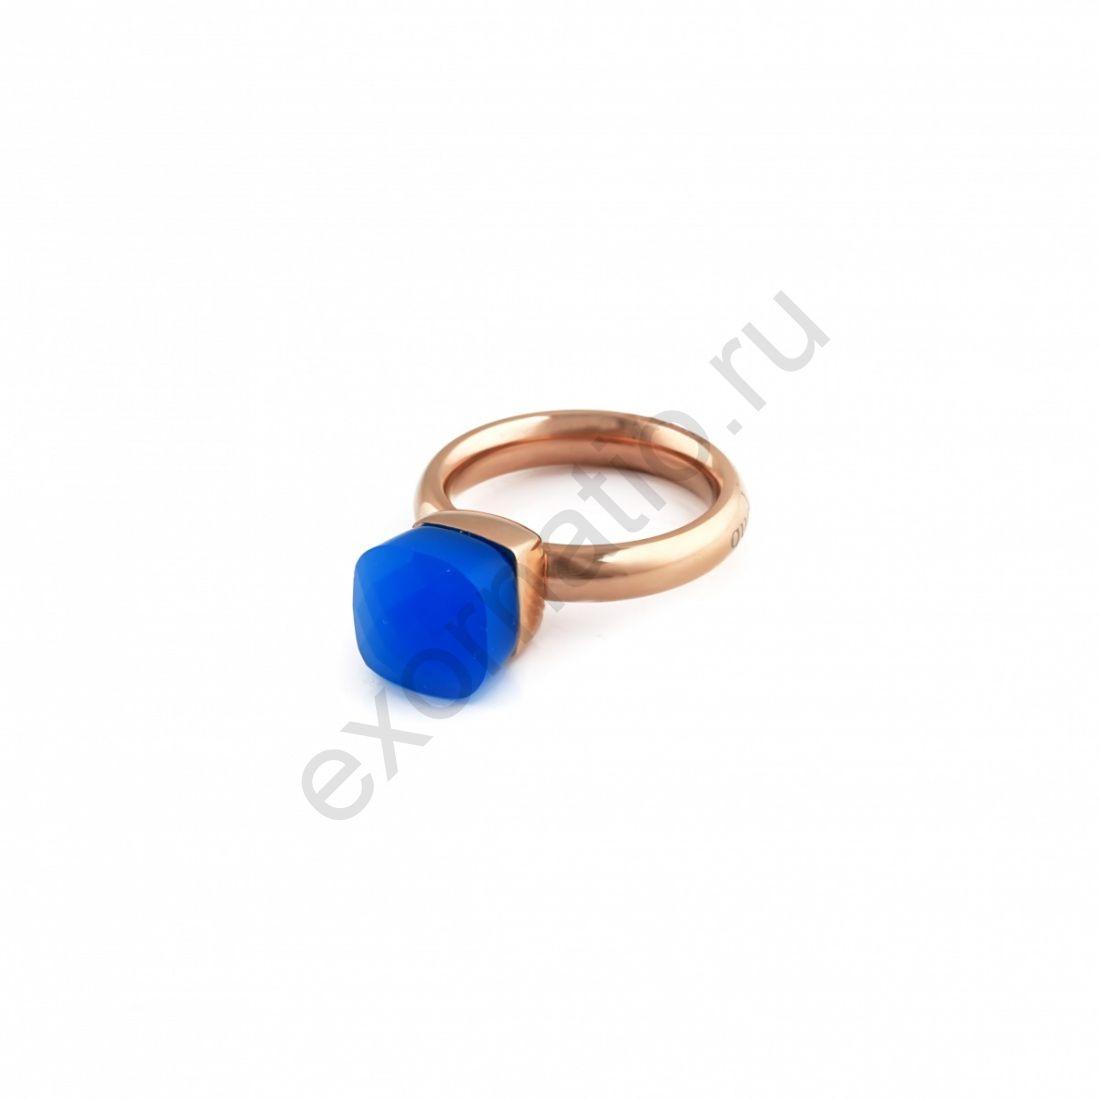 Кольцо Qudo 610550/17.8 BL/RG